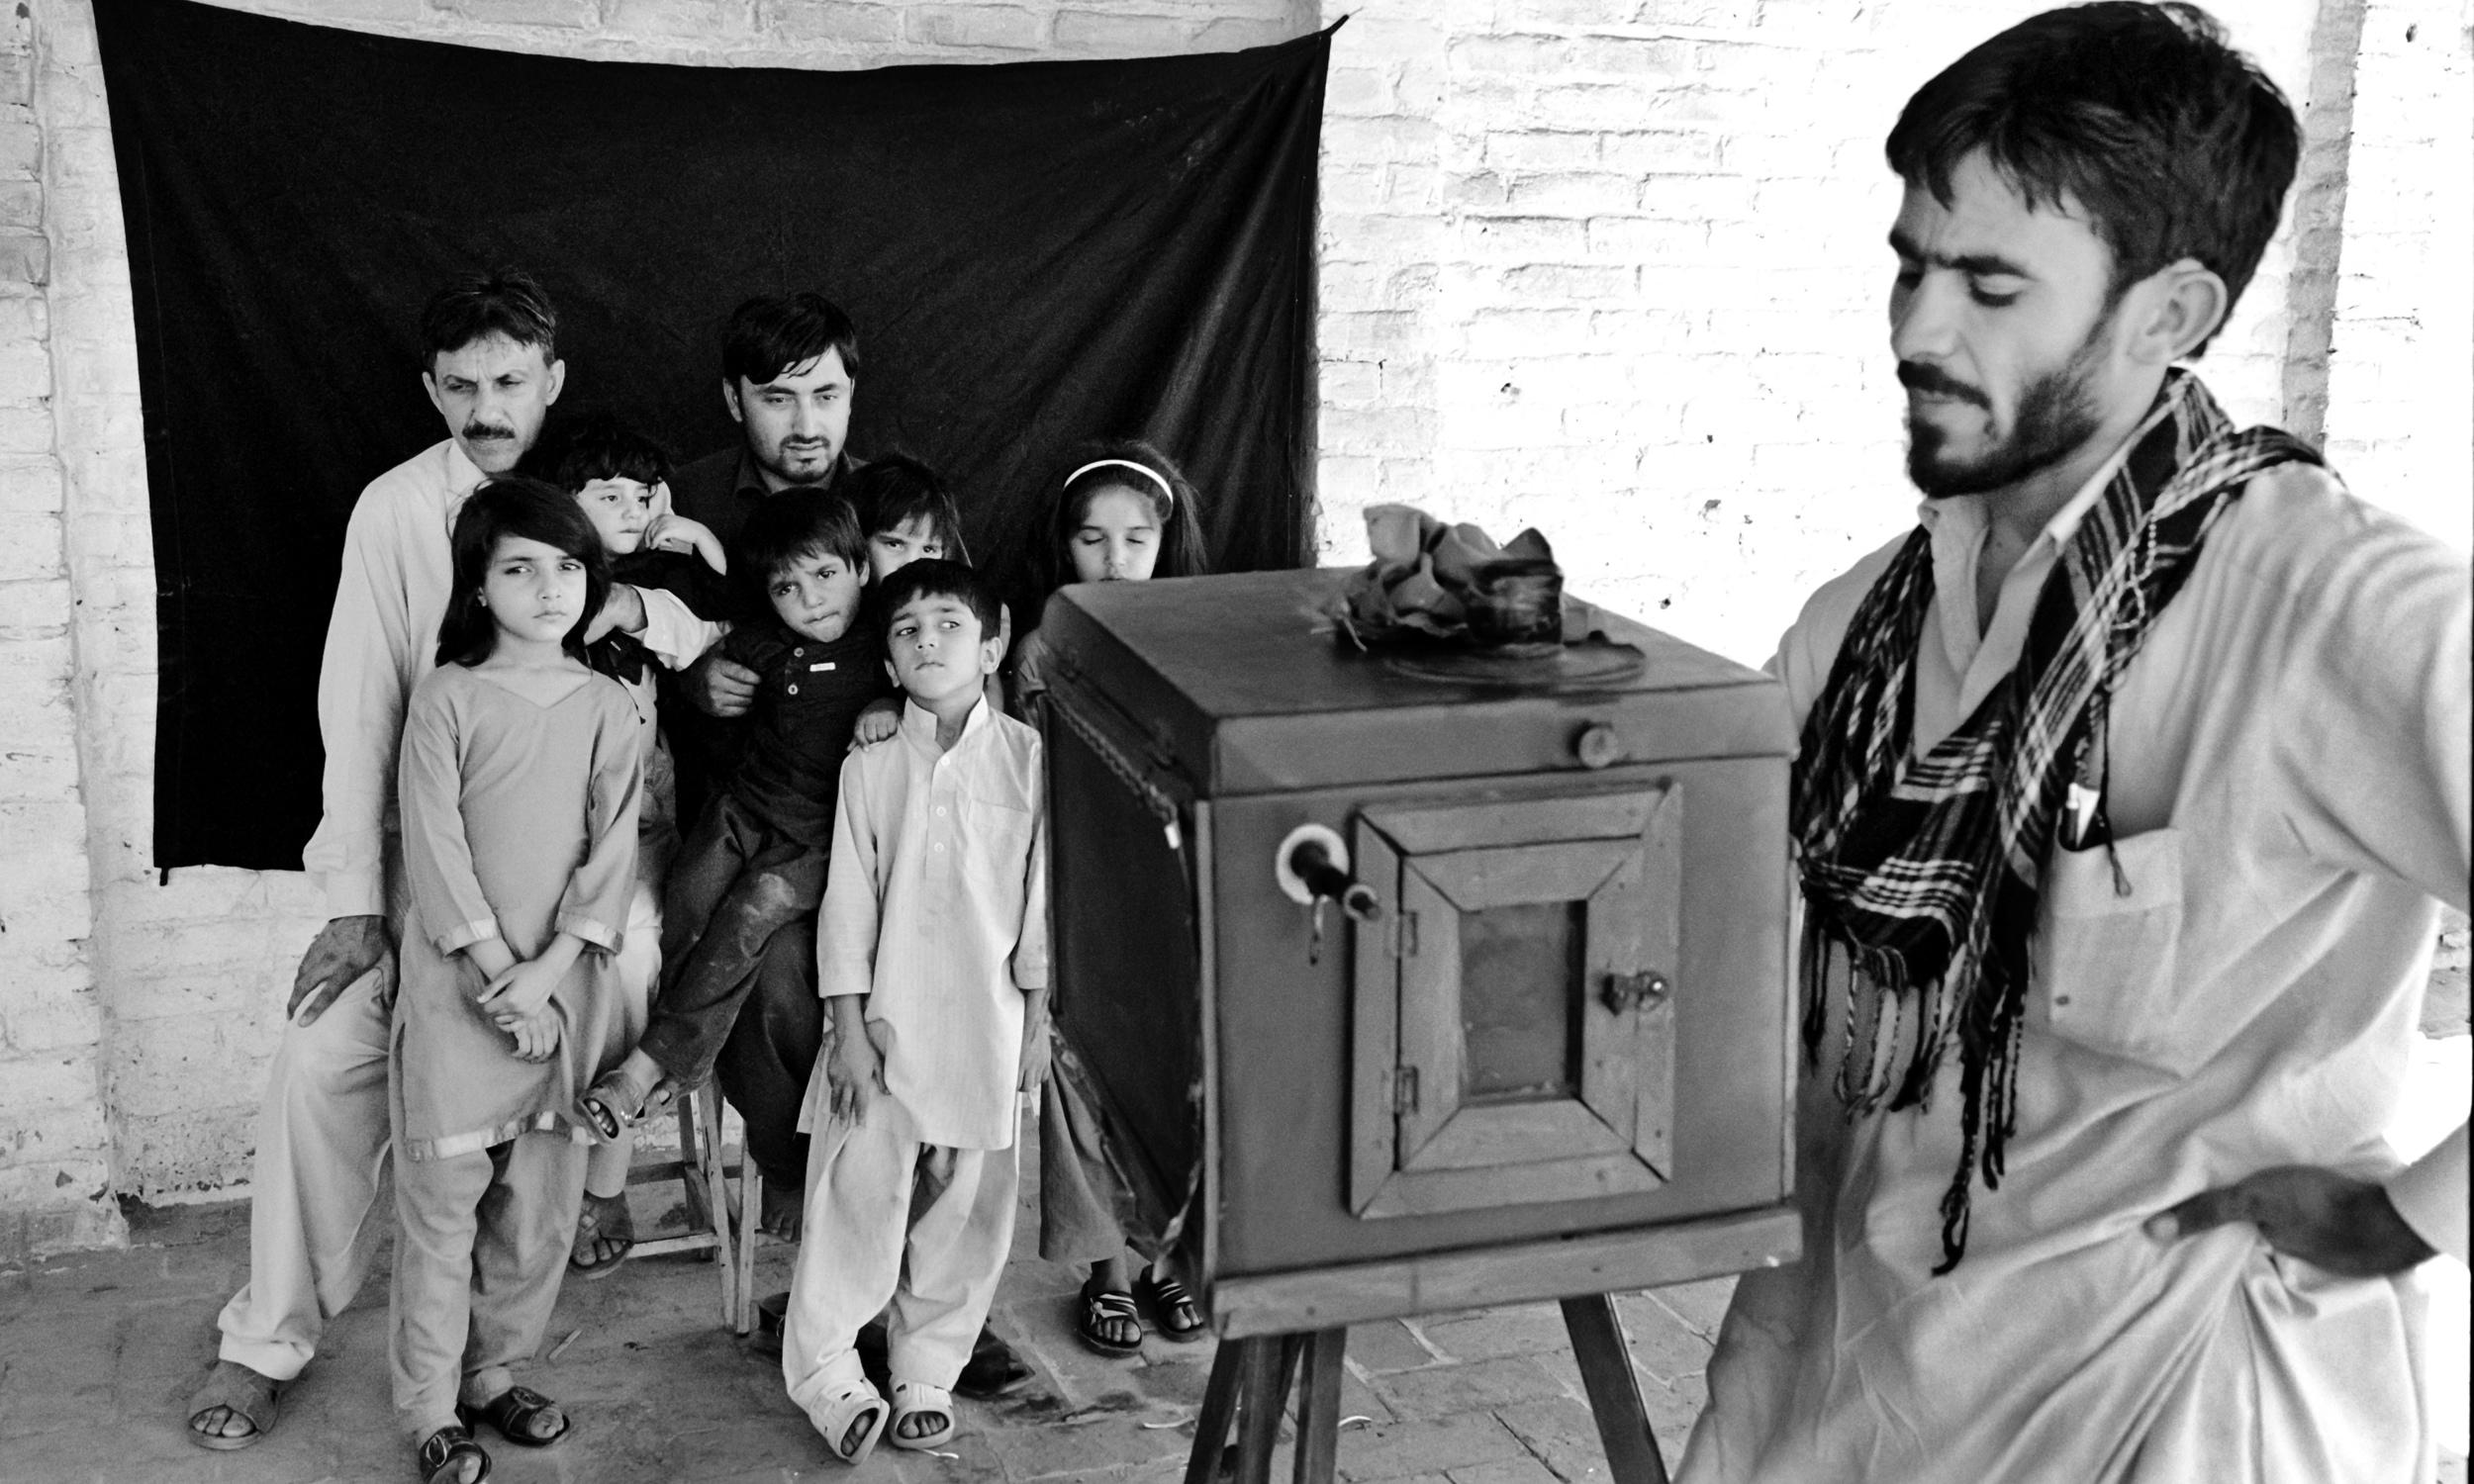 Izzat Ullah making a family photograph, Peshawar, 2012.